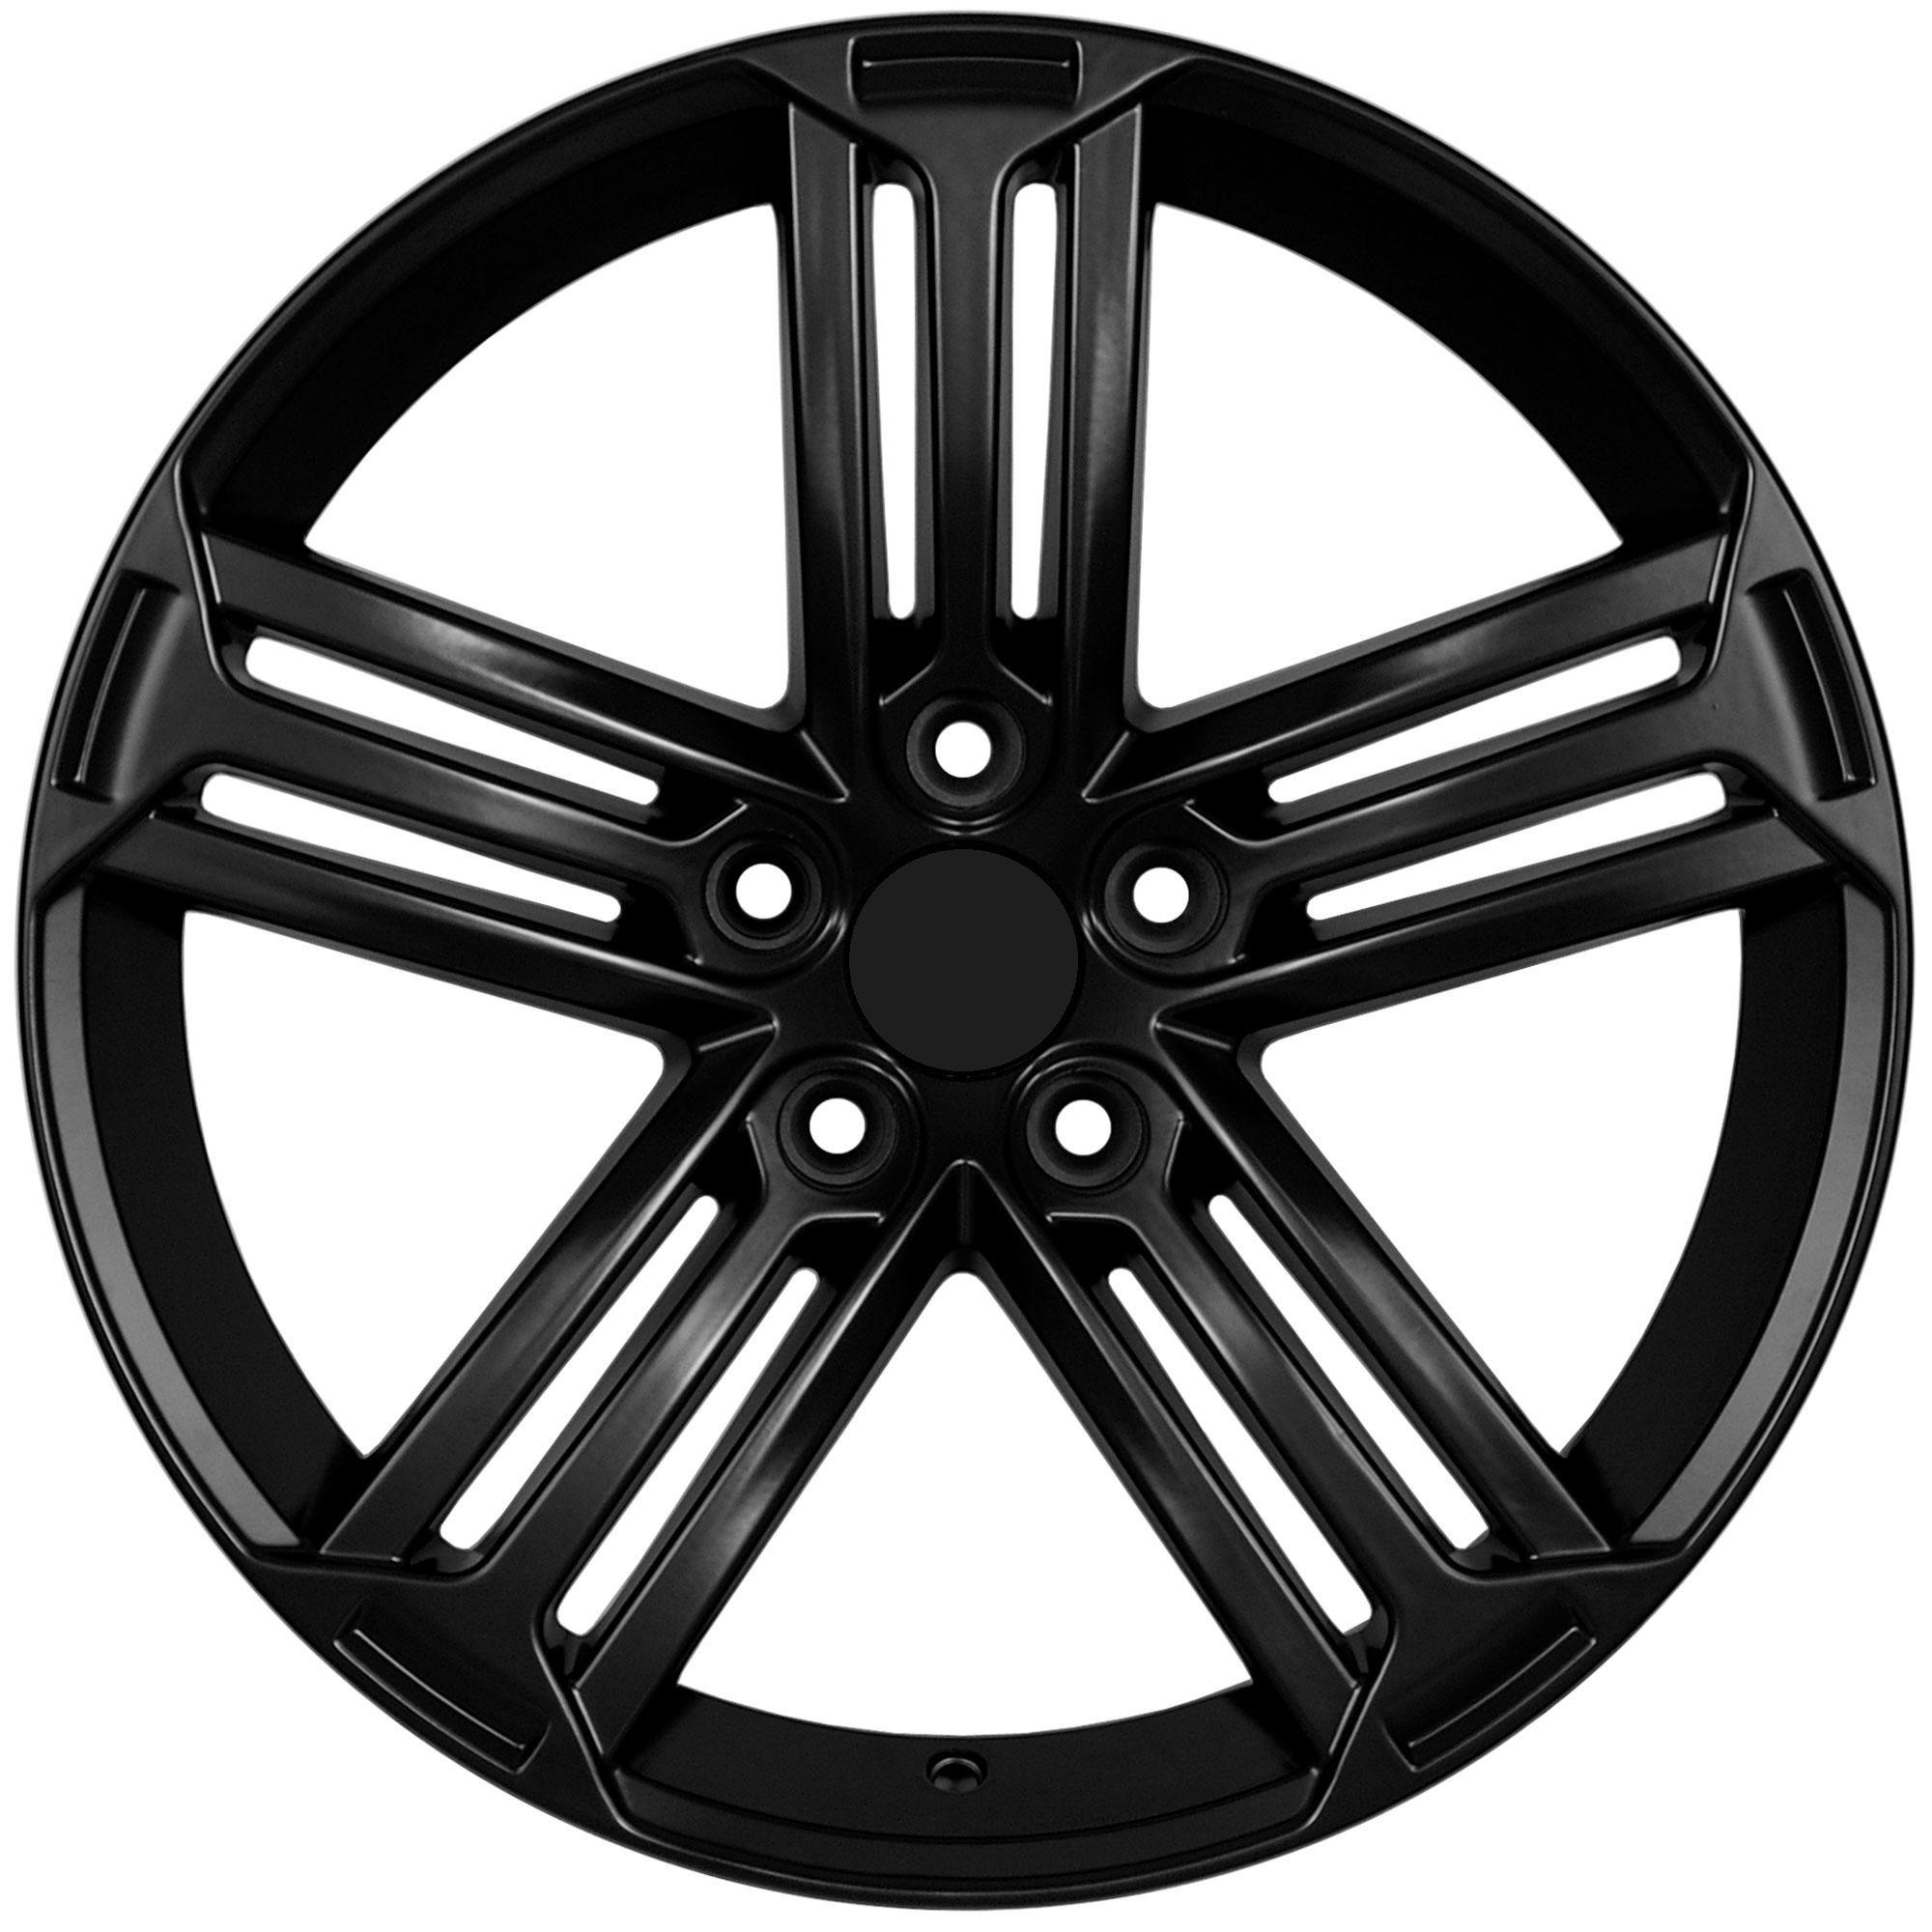 18 VW Golf R Style Matte Black Wheels Rims Fit VW Golf Rabbit GTI MKV